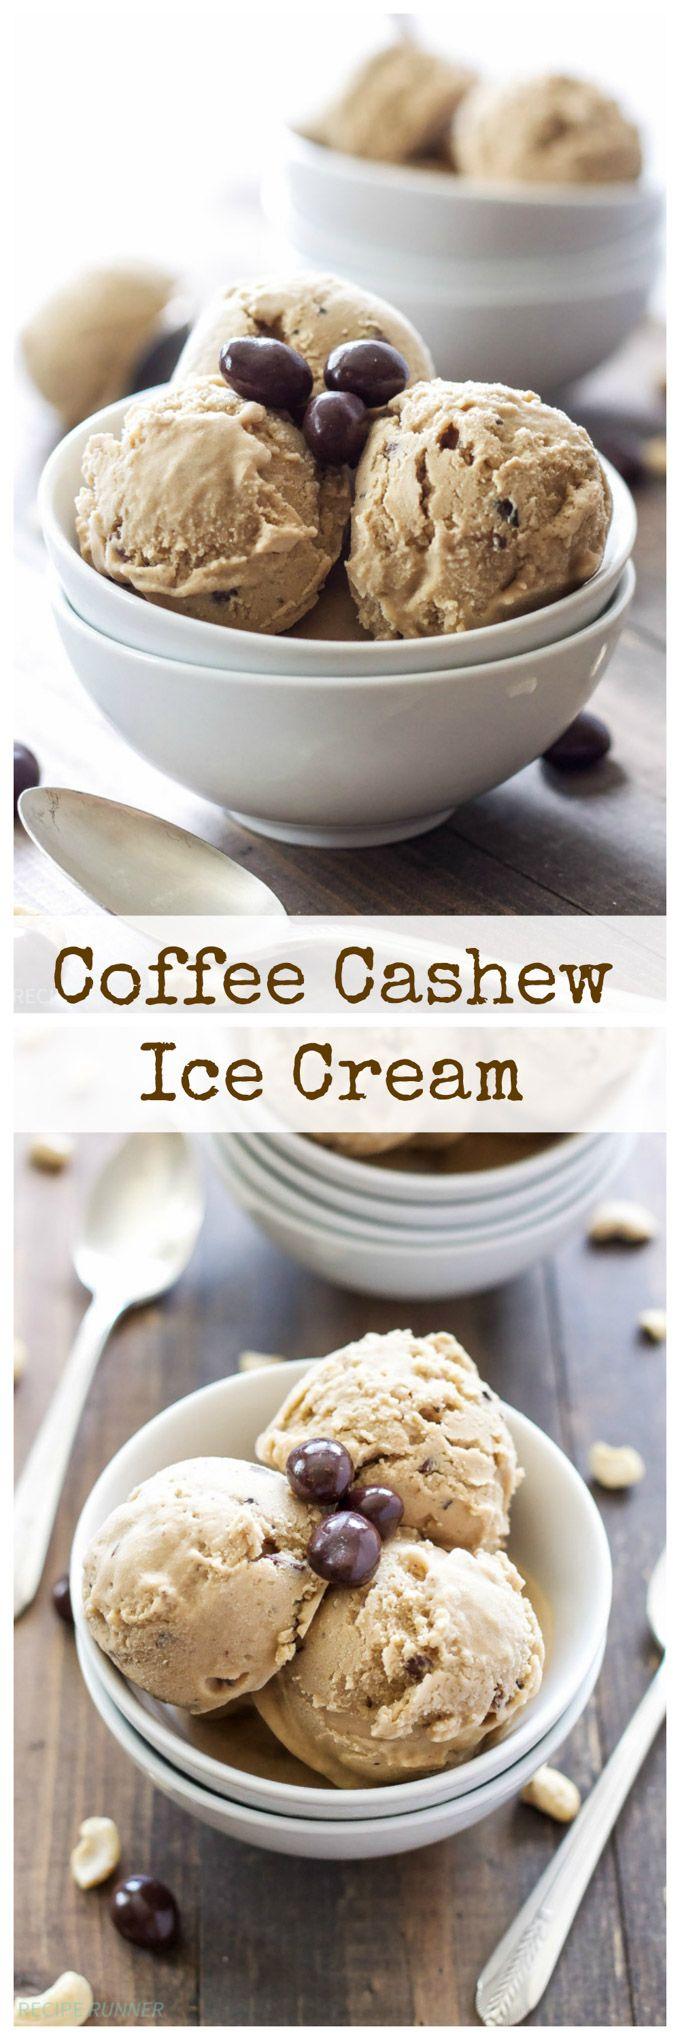 Coffee Cashew Ice Cream | You'll never suspect this Coffee Cashew Ice Cream is dairy-free and vegan! #ad